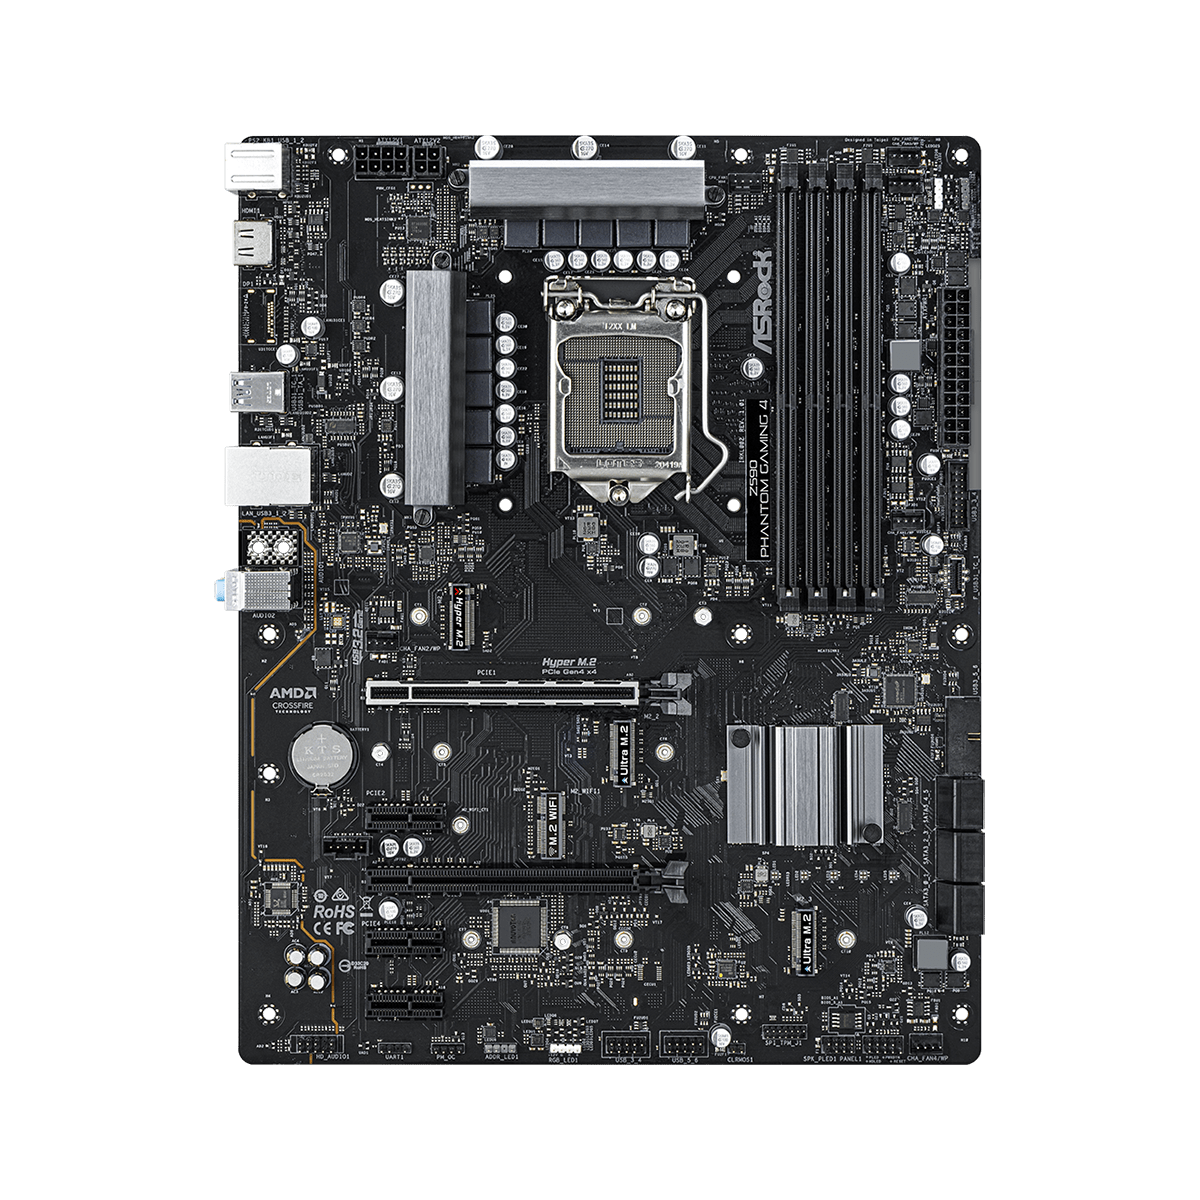 Placa Mãe ASRock Z590 Phantom Gaming 4, Chipset Intel Z590, Socket 1200, ATX, DDR4